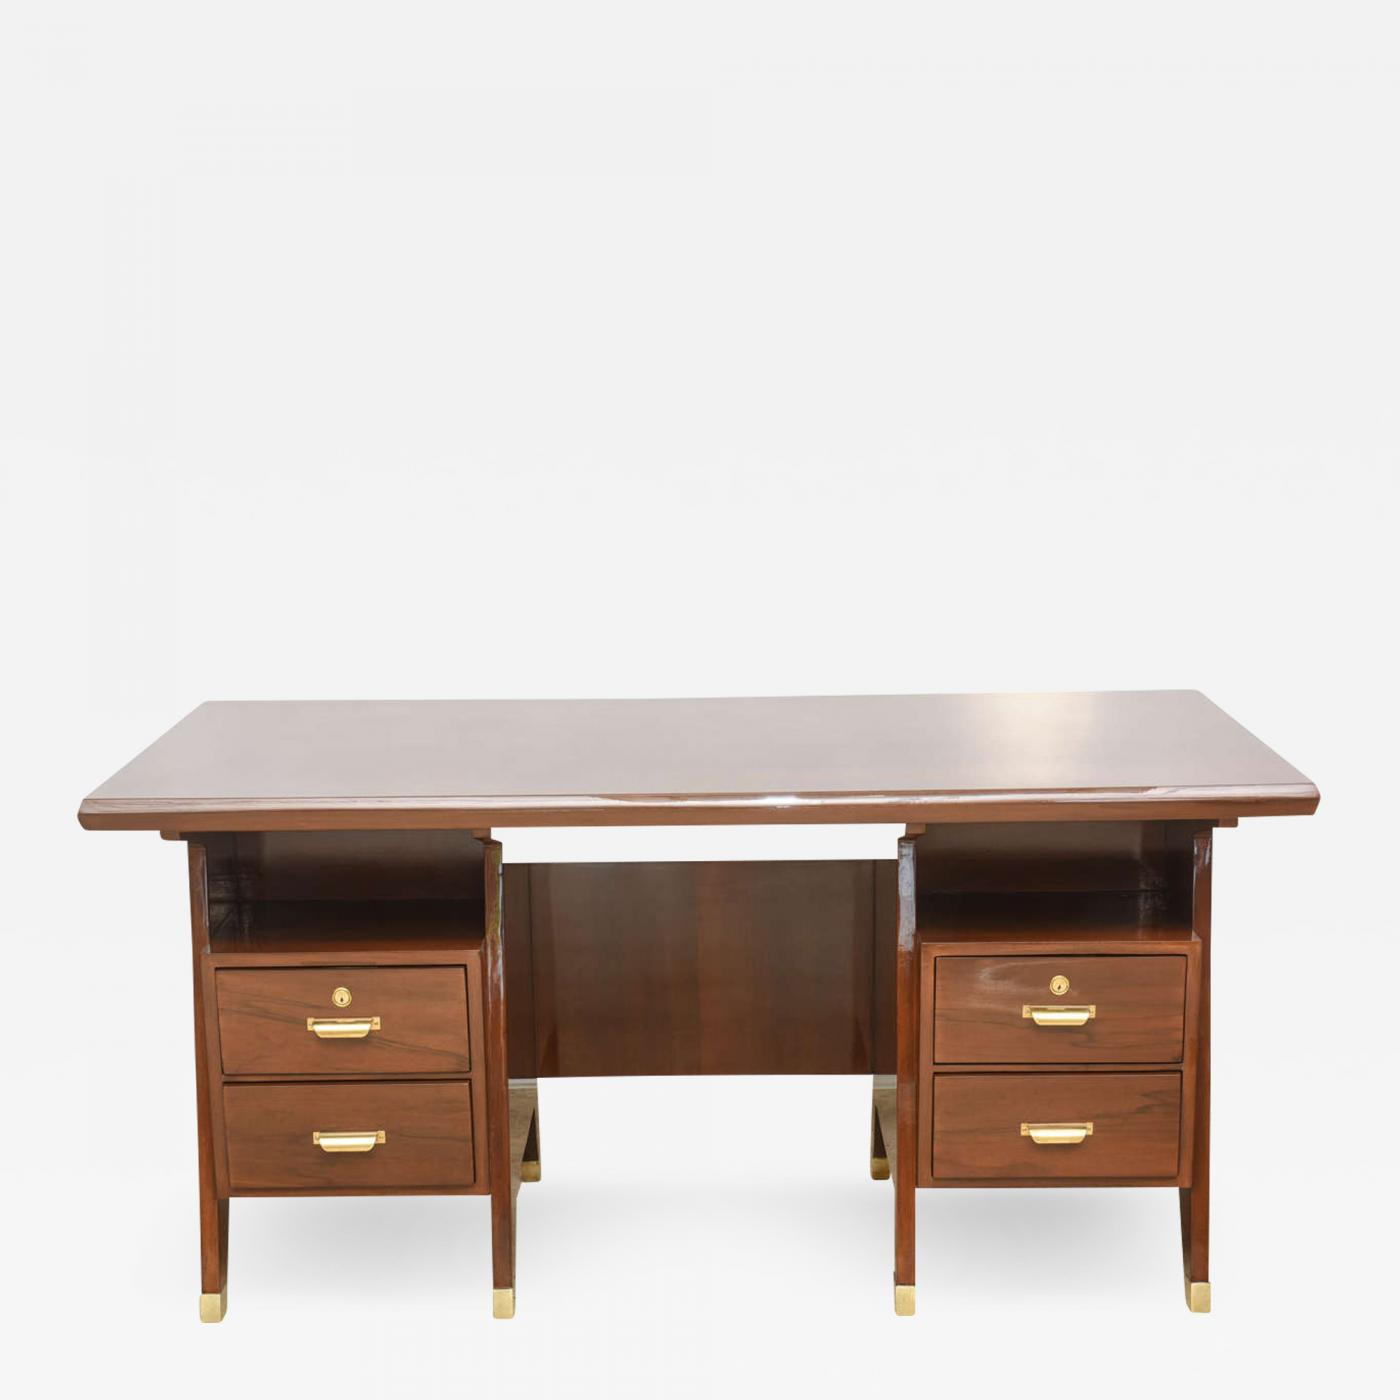 Image of: Gio Ponti Italian Modern Walnut And Brass Executive Desk Gio Ponti